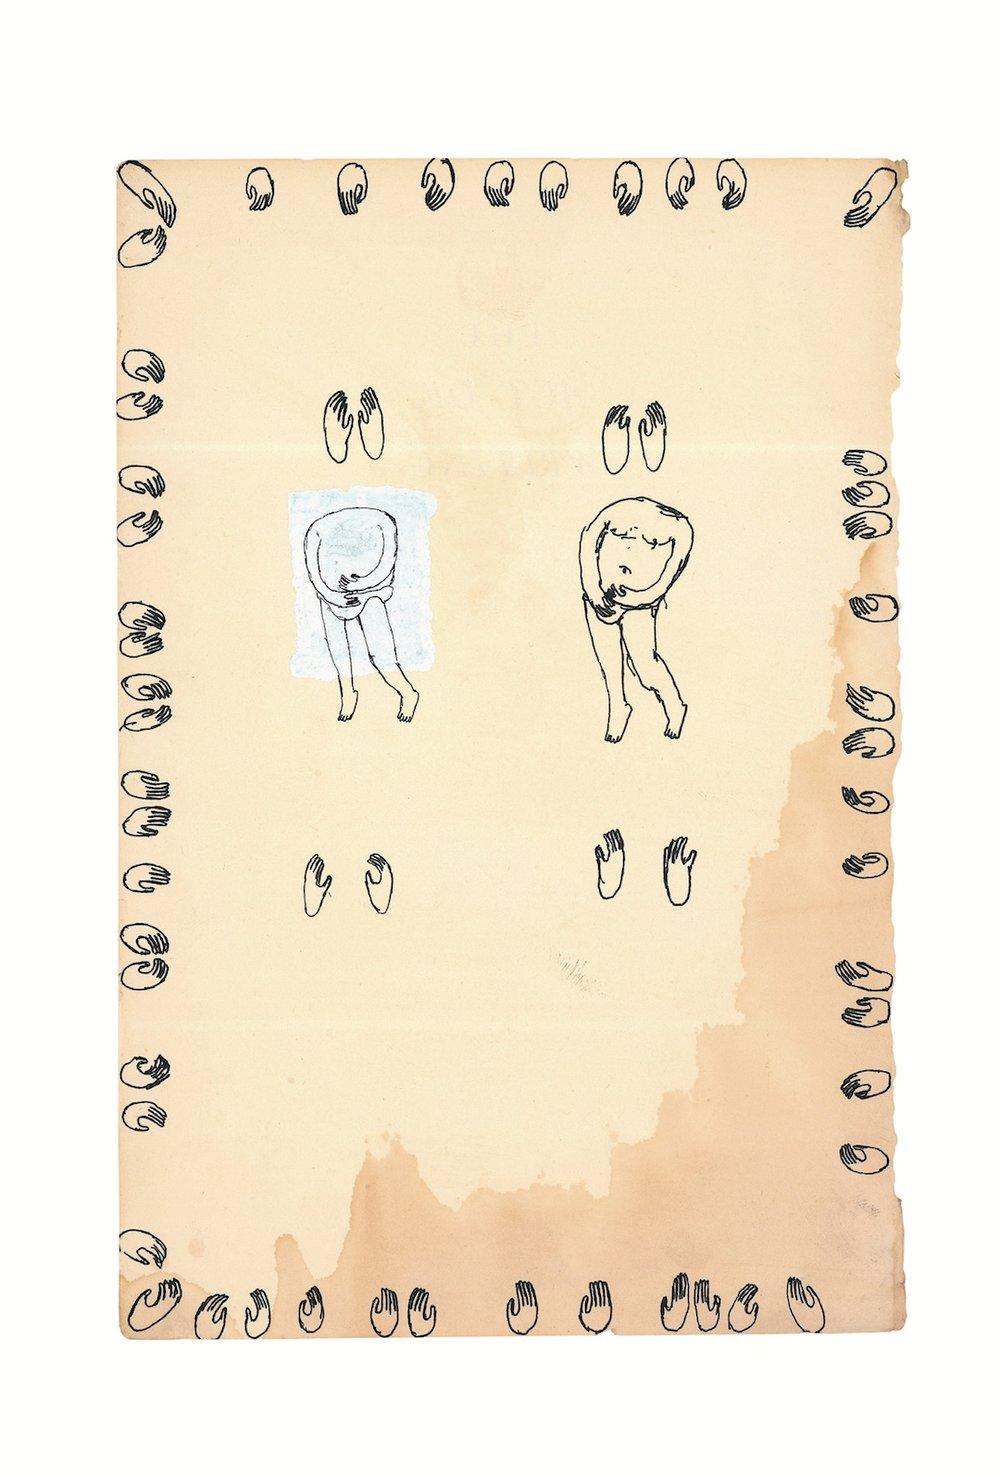 p.-44.jpg